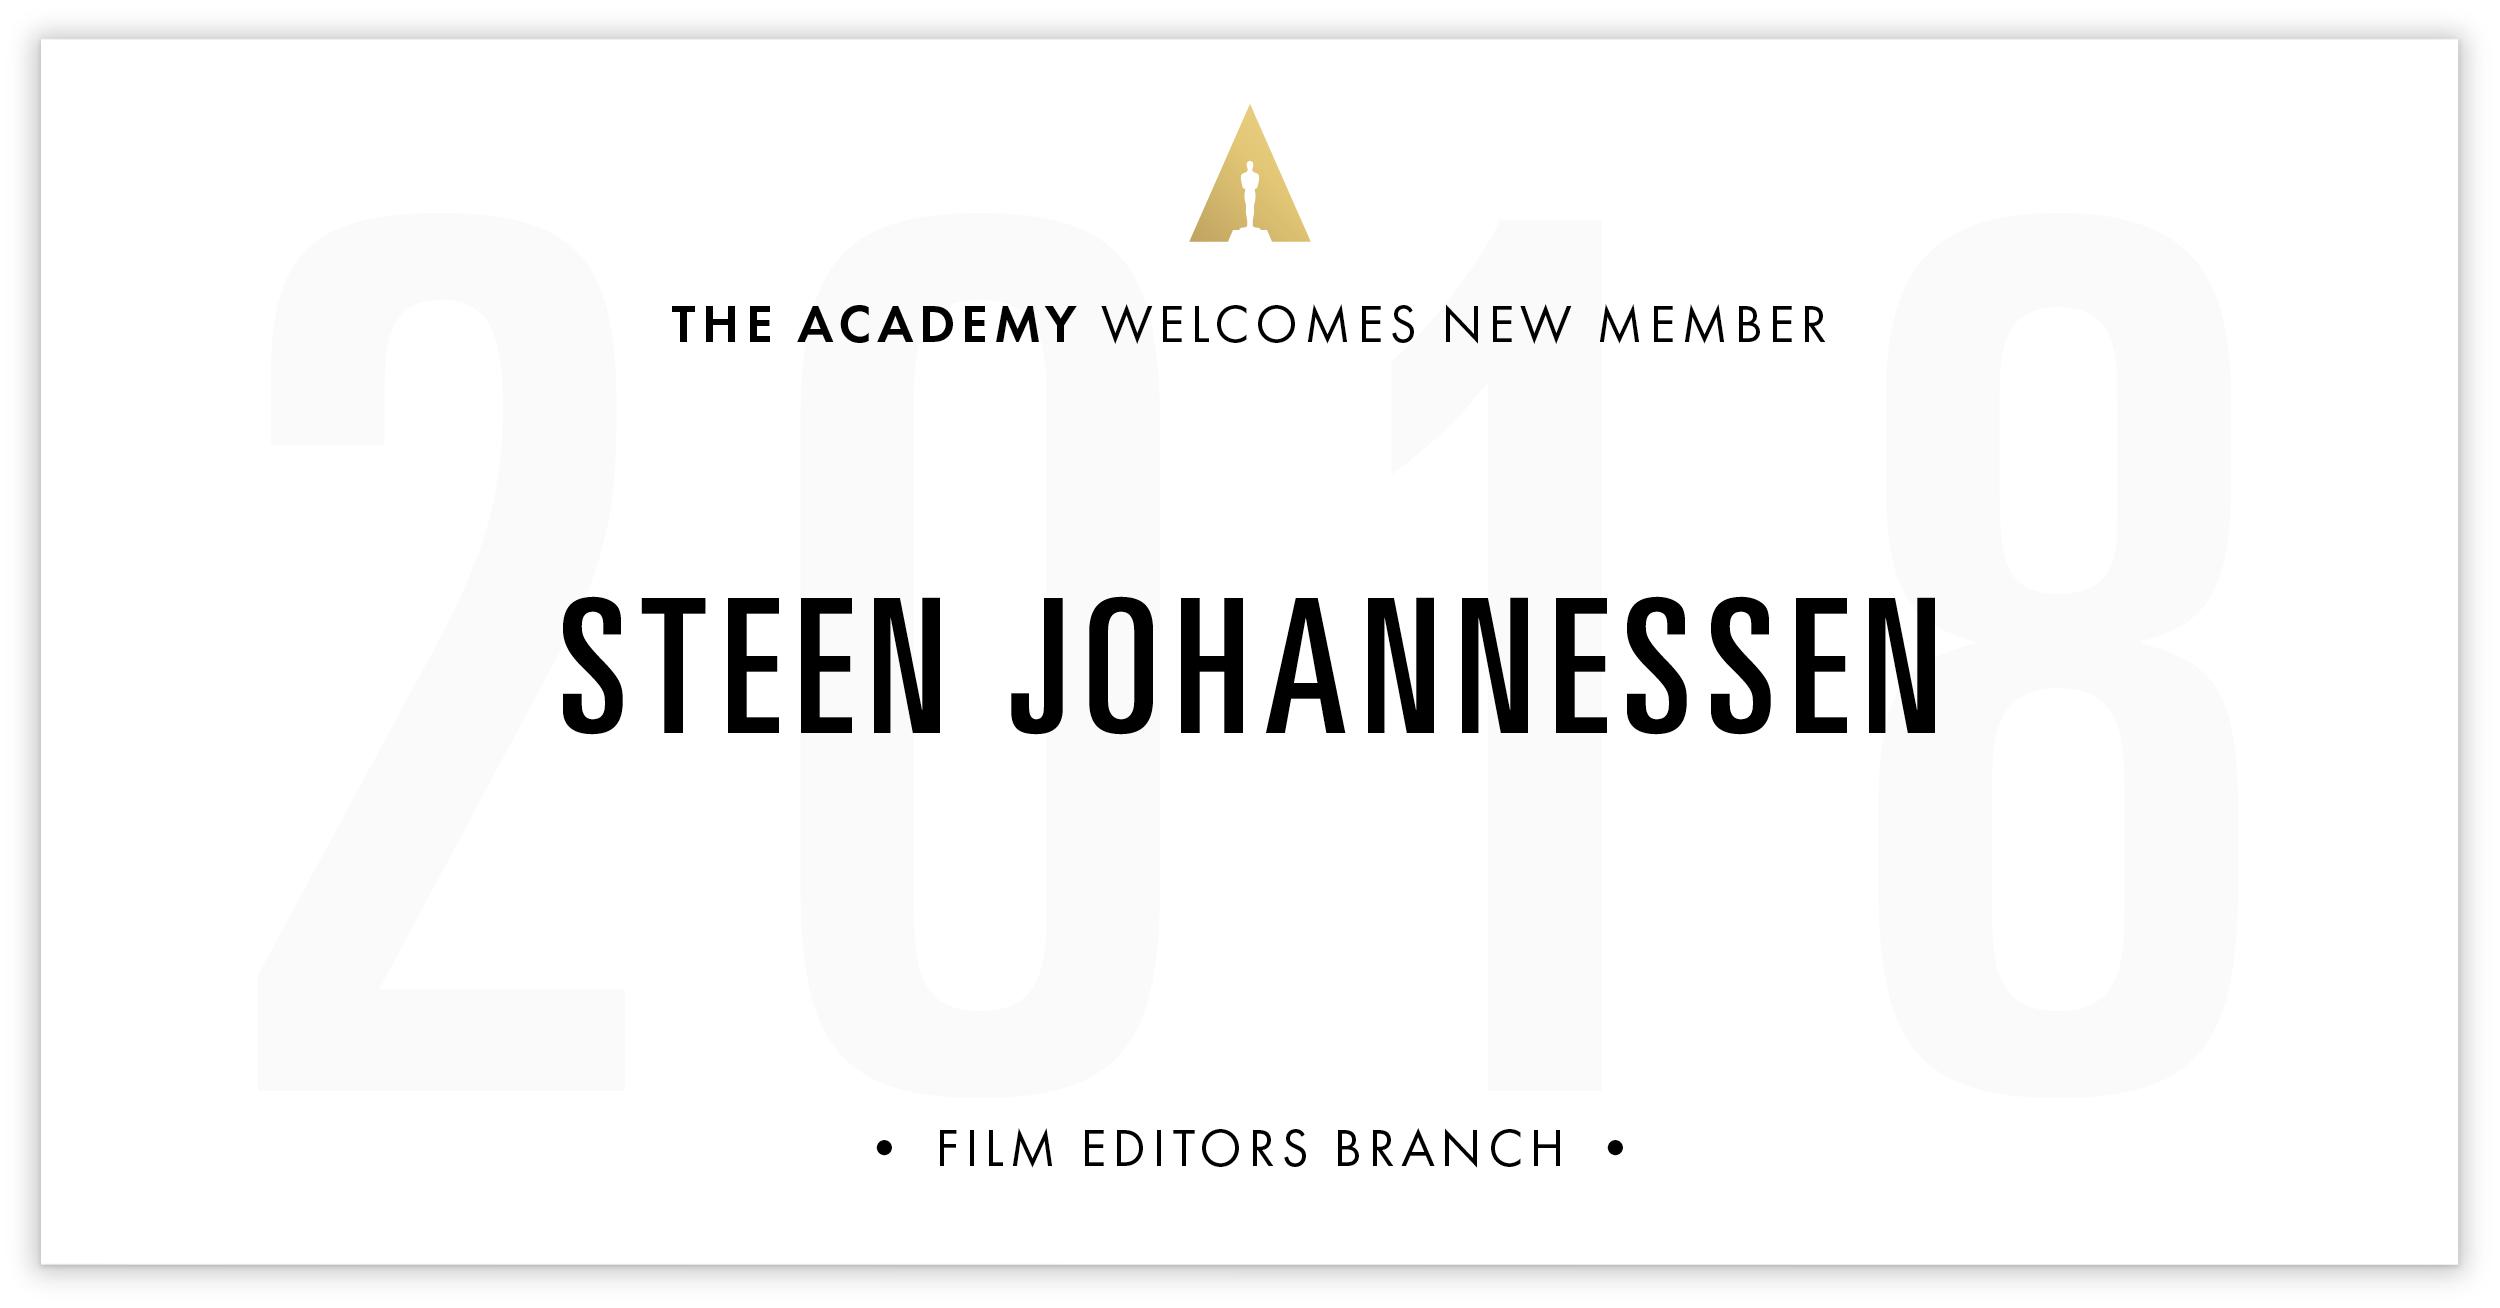 Steen Johannessen is invited!